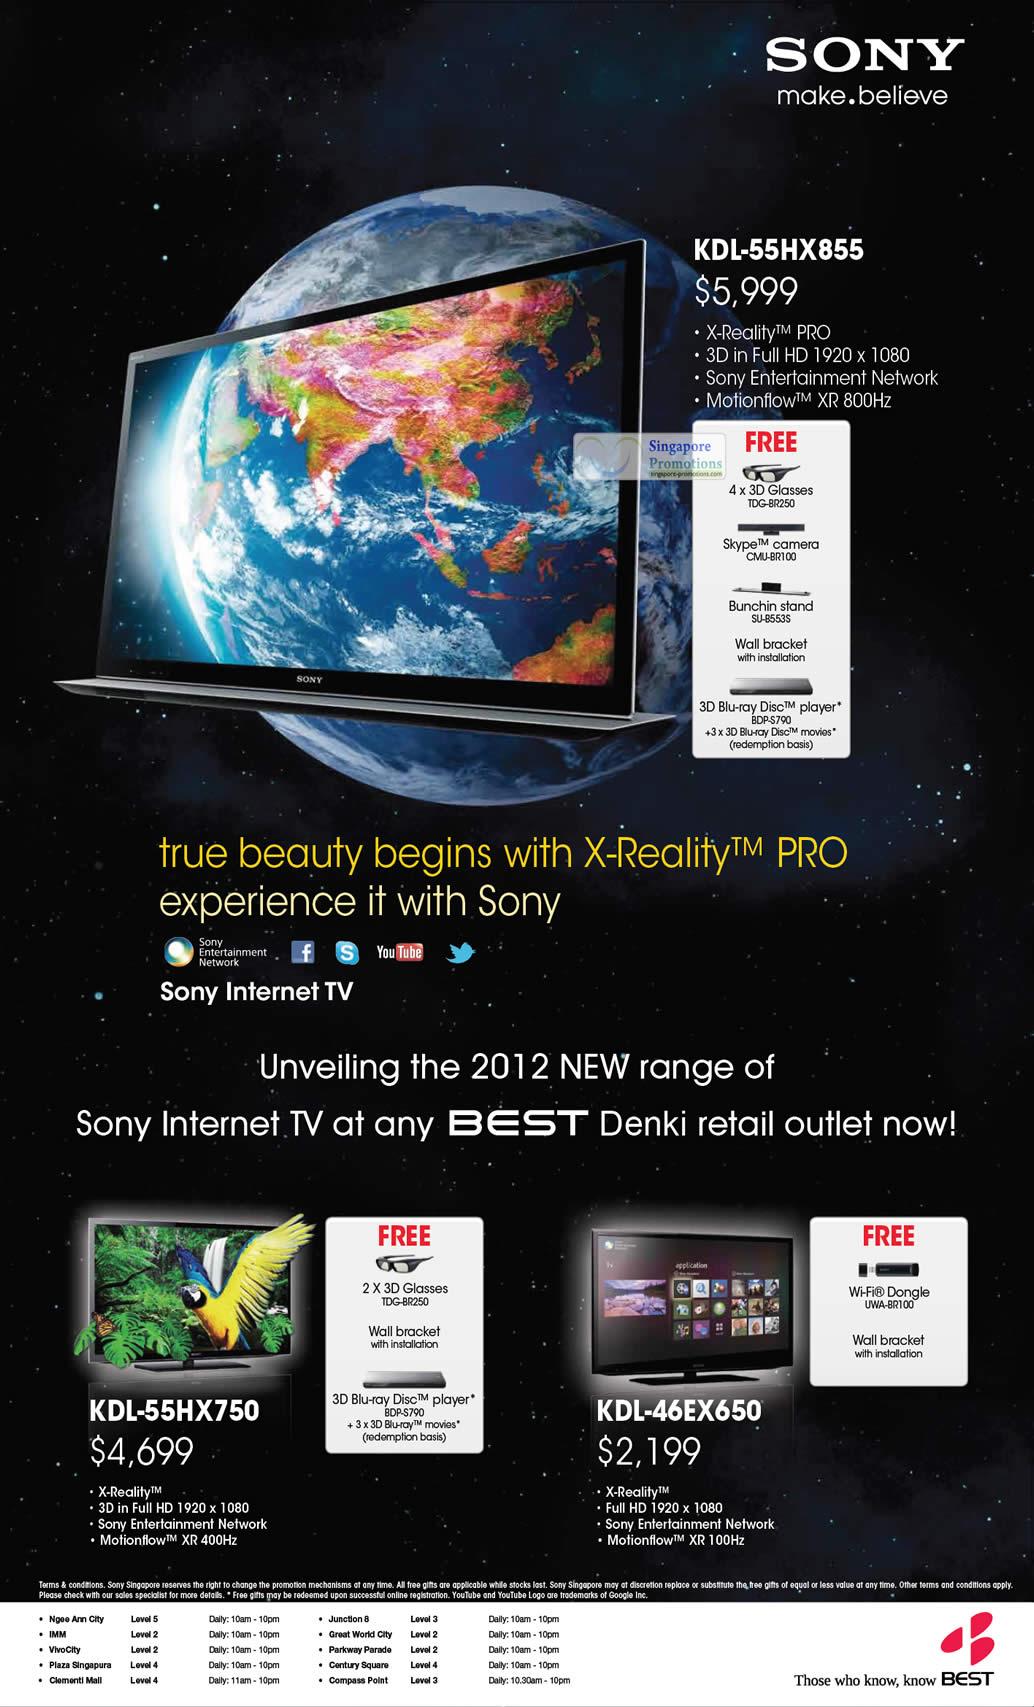 SONY KDL-55HX855 TV, SONY KDL-46EX650 TV, SONY KDL-55HX750 TV